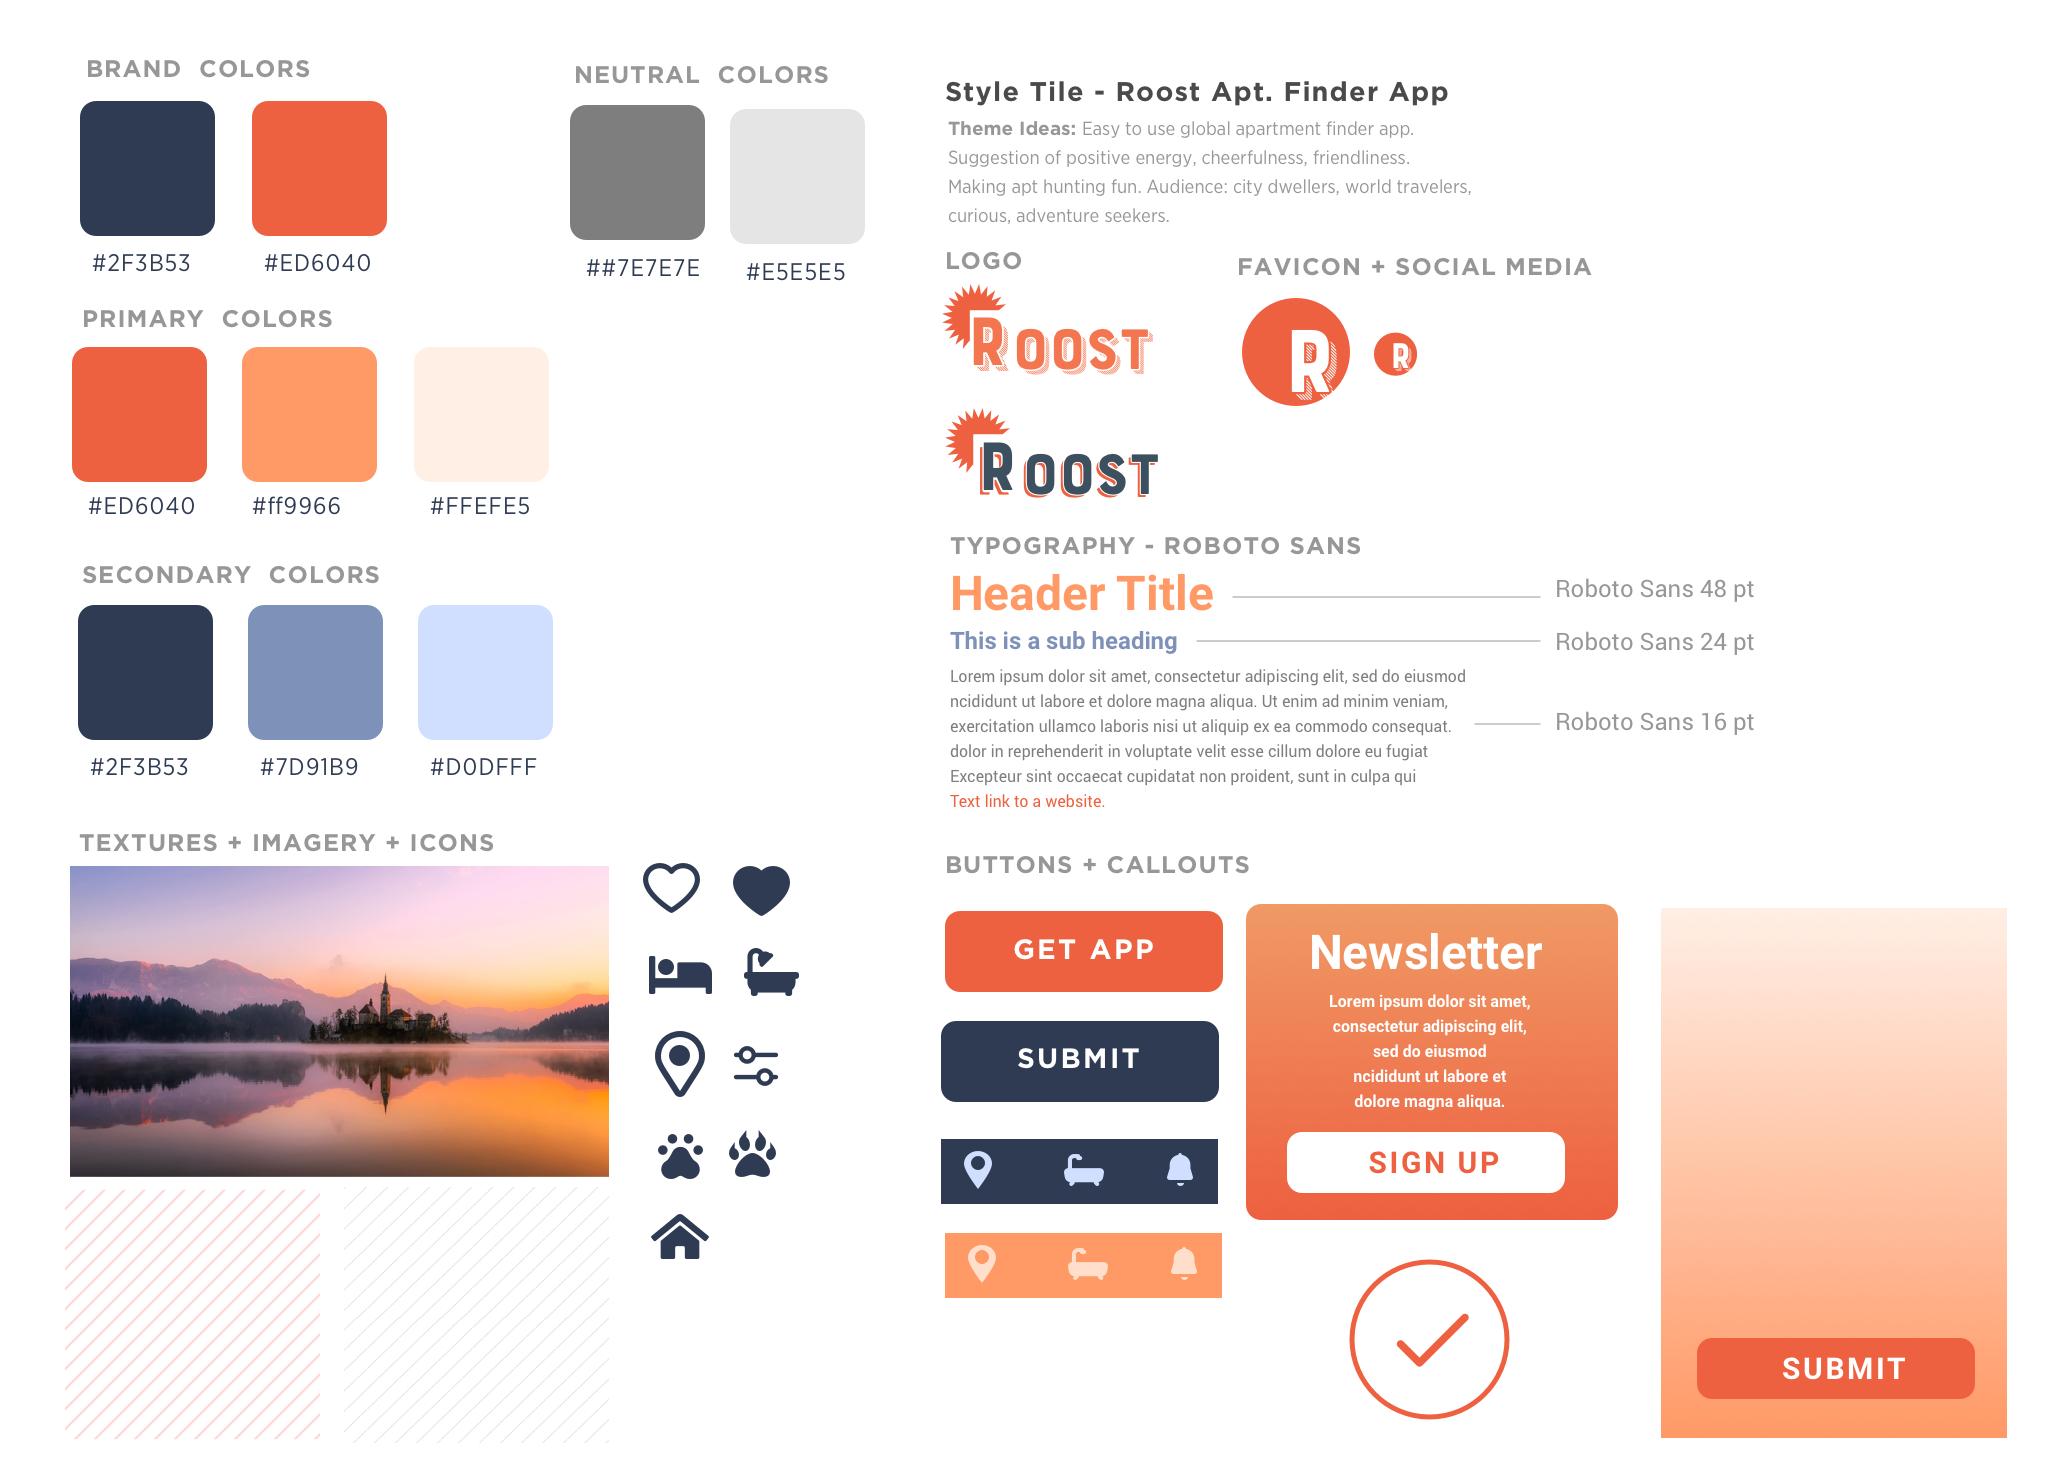 Style tile v2 - Roost.jpg